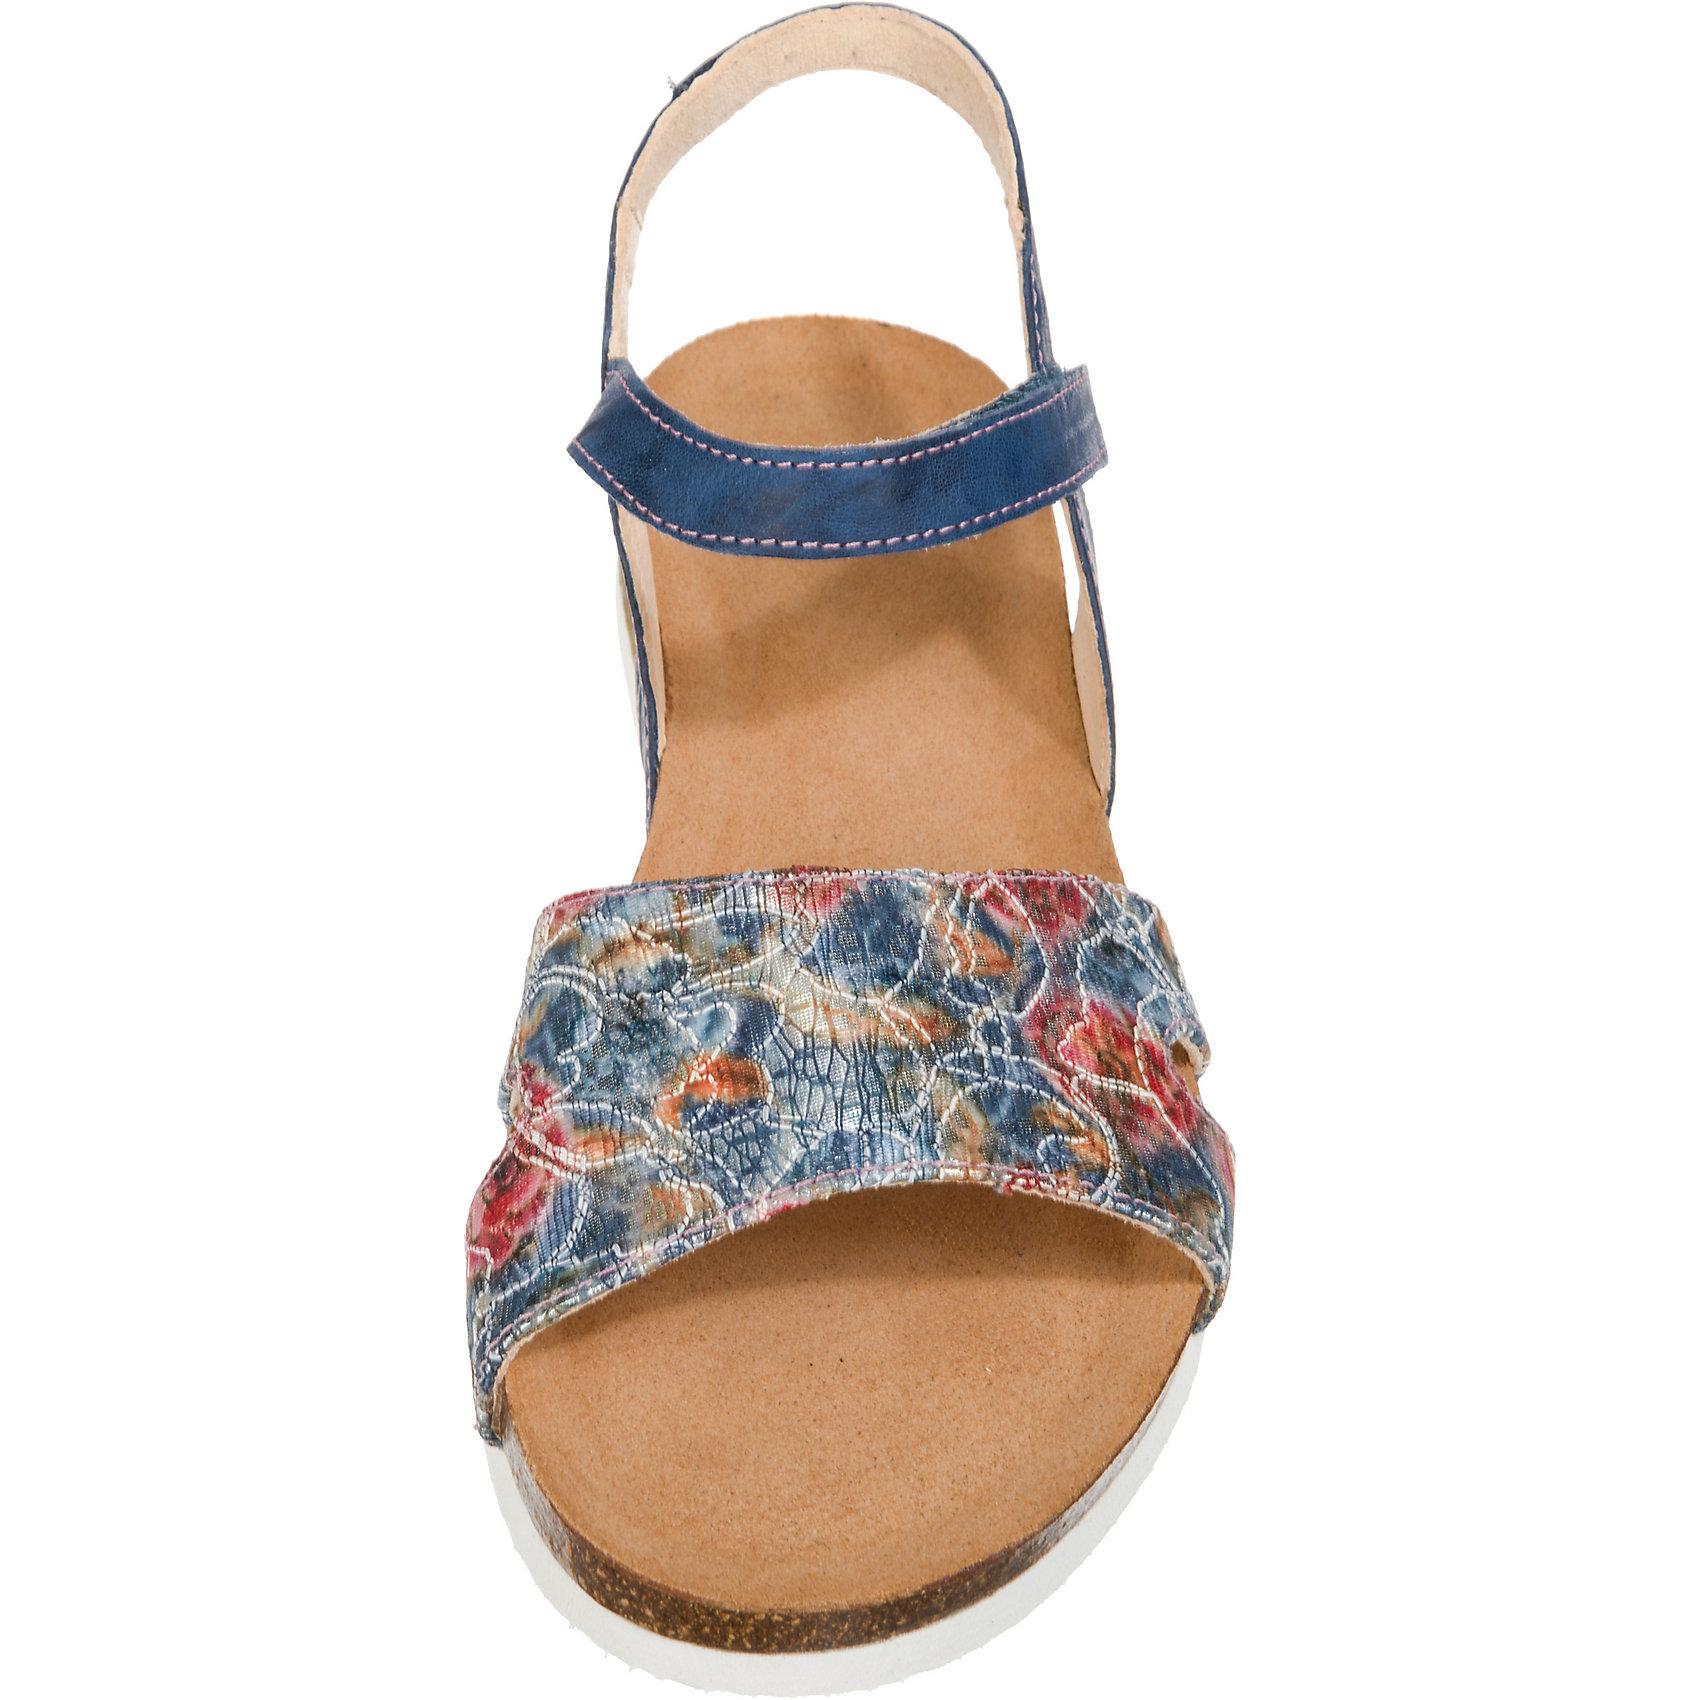 Neu Think  Shik Komfort-Sandale 7208851 für Damen blau-kombi